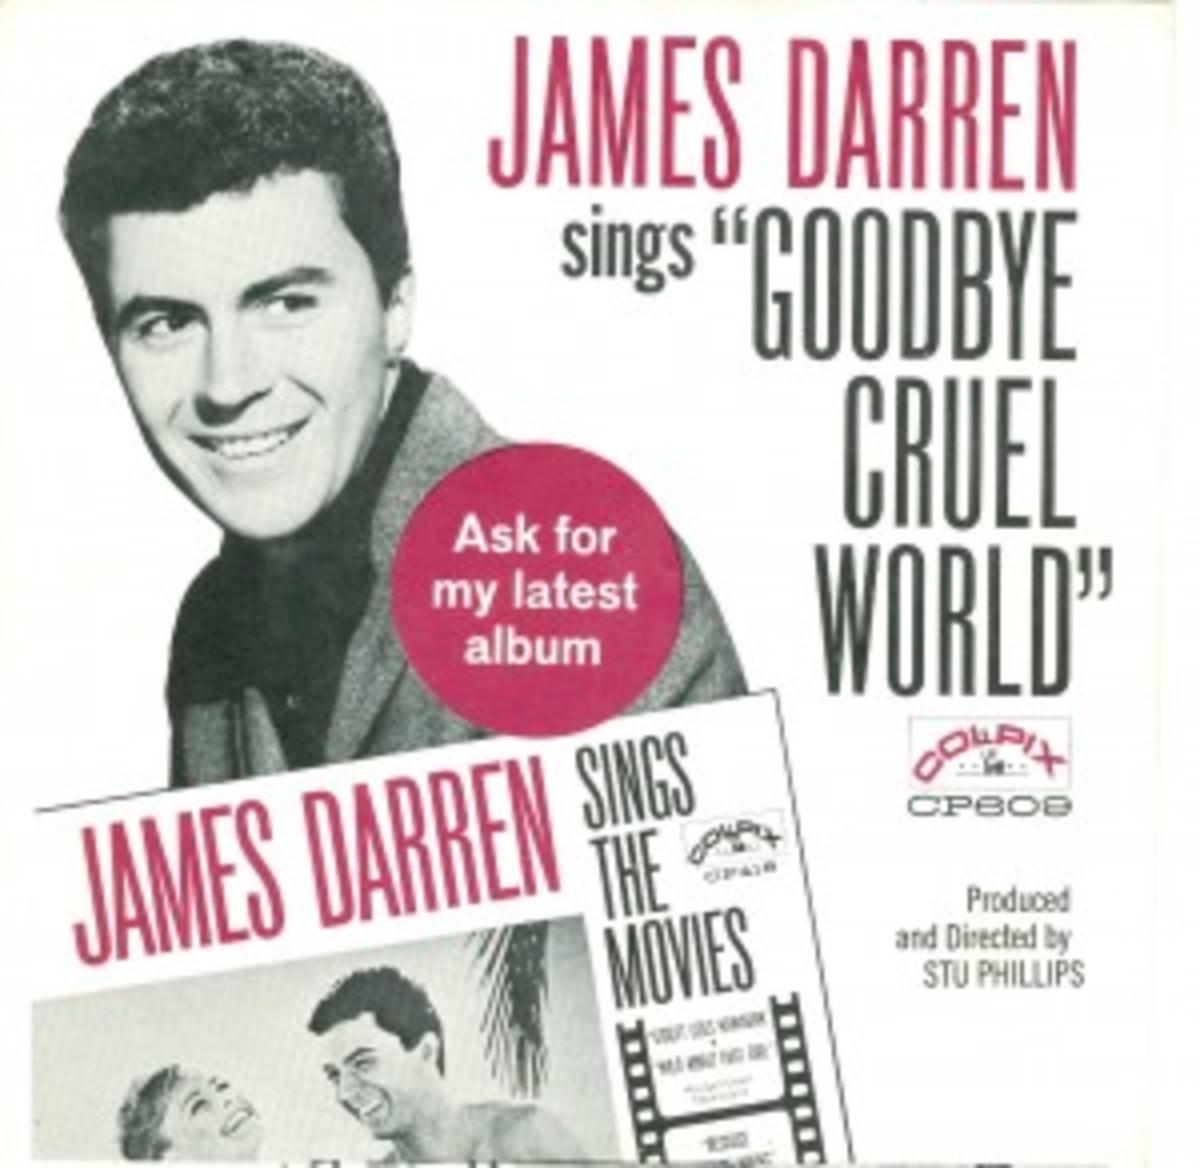 James Darren Goodbye Cruel World picture sleeve